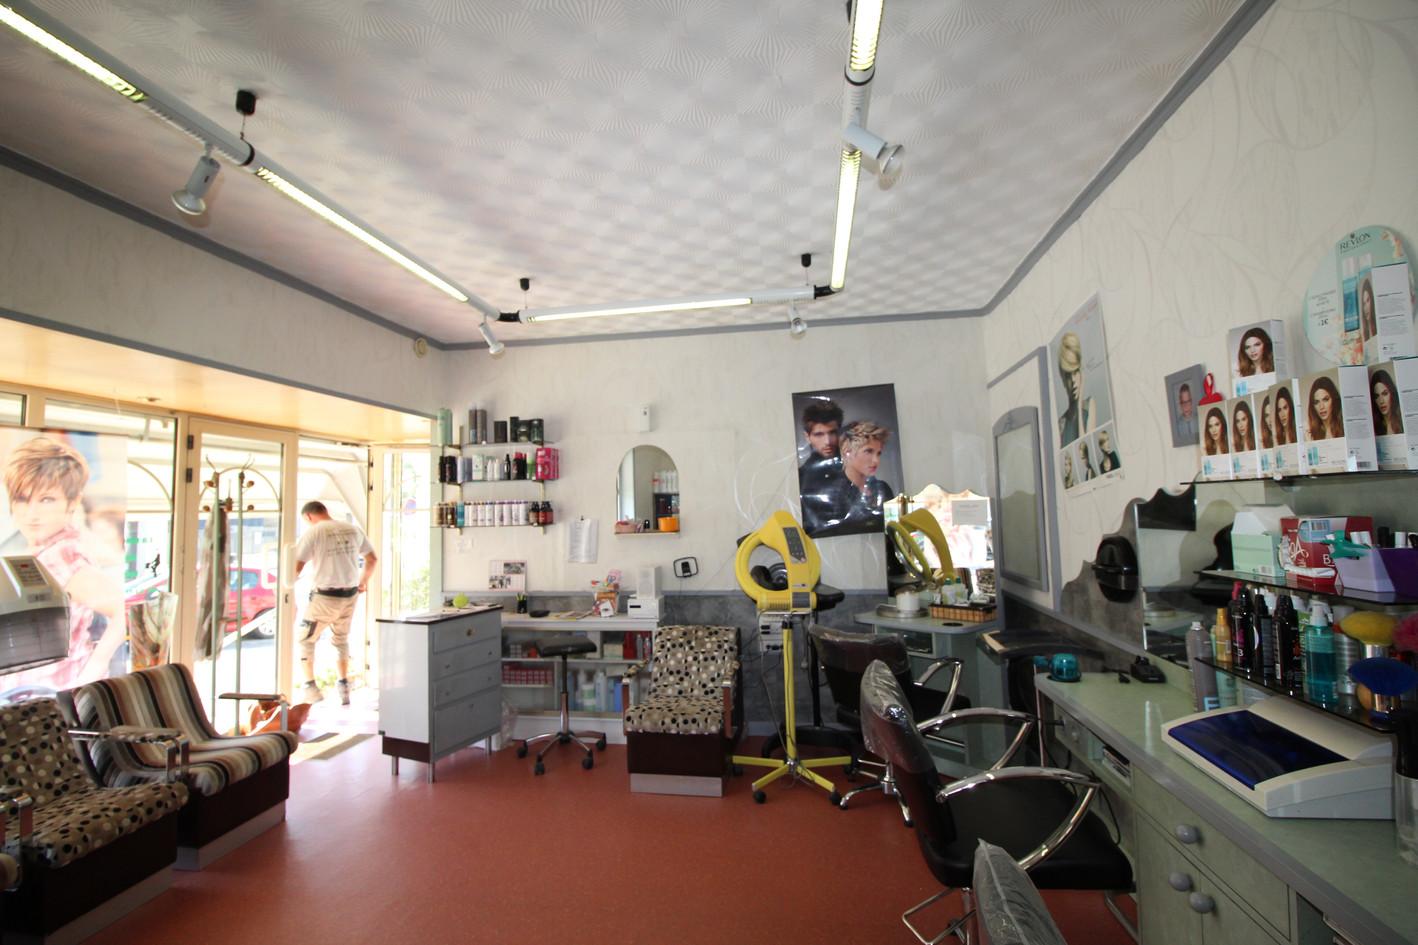 Salon de coiffure avant projet